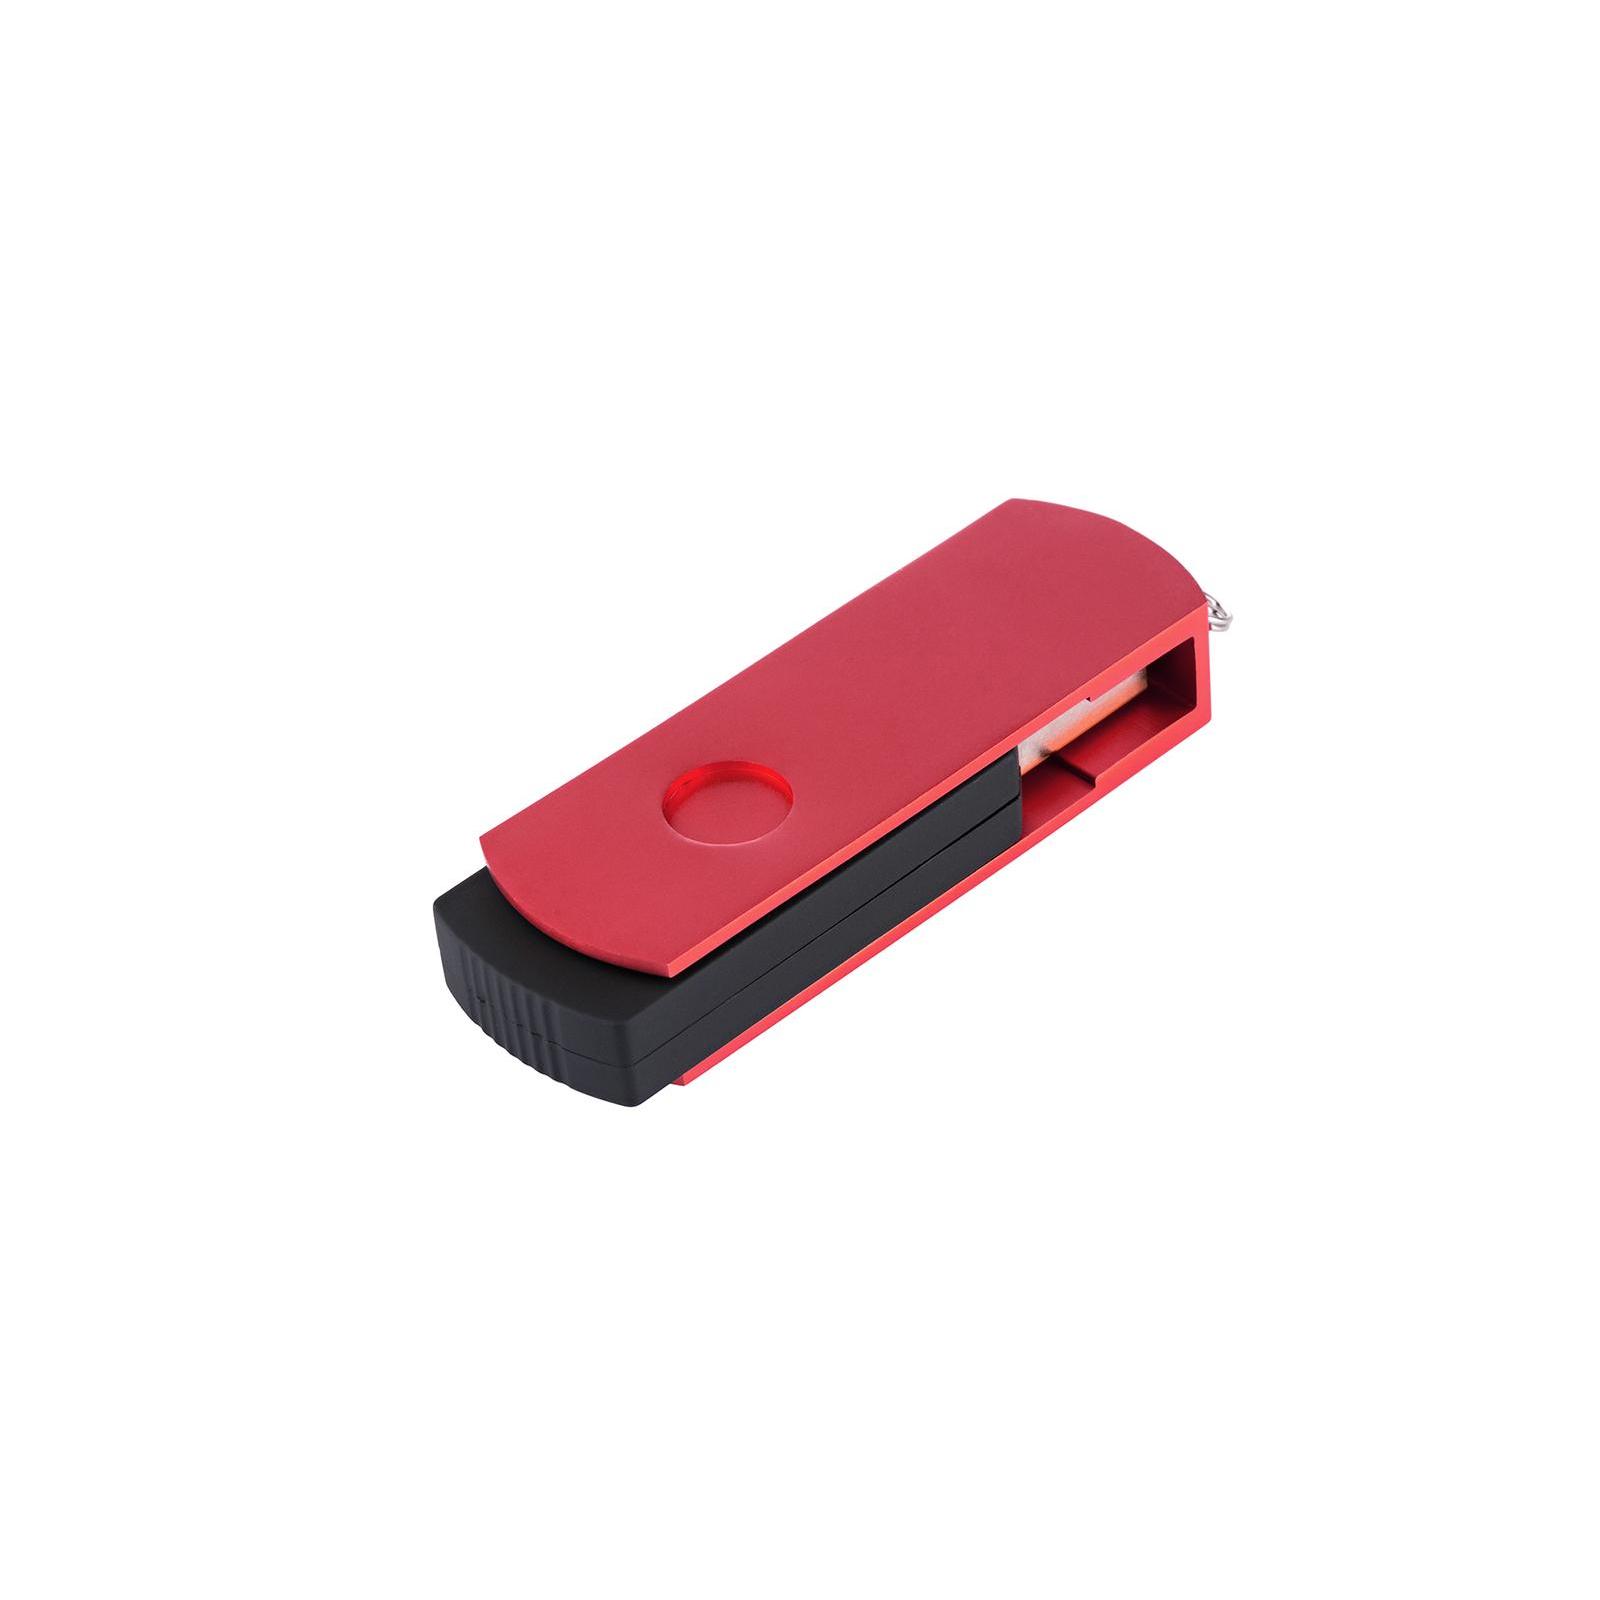 USB флеш накопитель eXceleram 32GB P2 Series Silver/Black USB 3.1 Gen 1 (EXP2U3SIB32) изображение 6